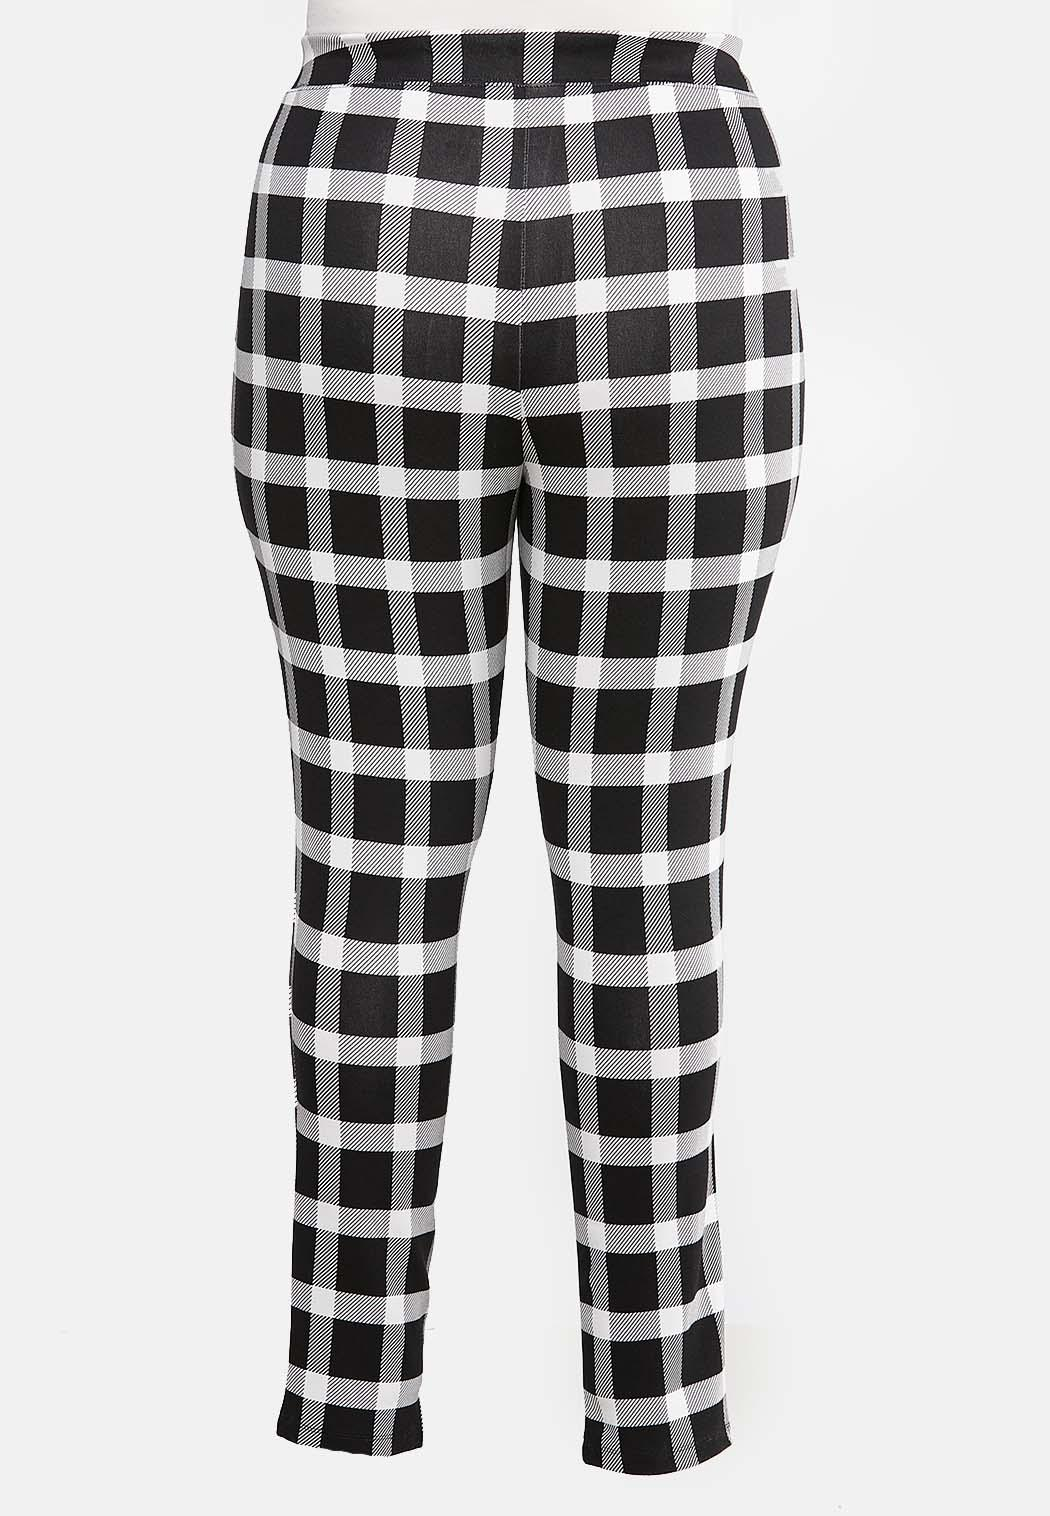 Plus Size Black White Plaid Leggings (Item #43995688)